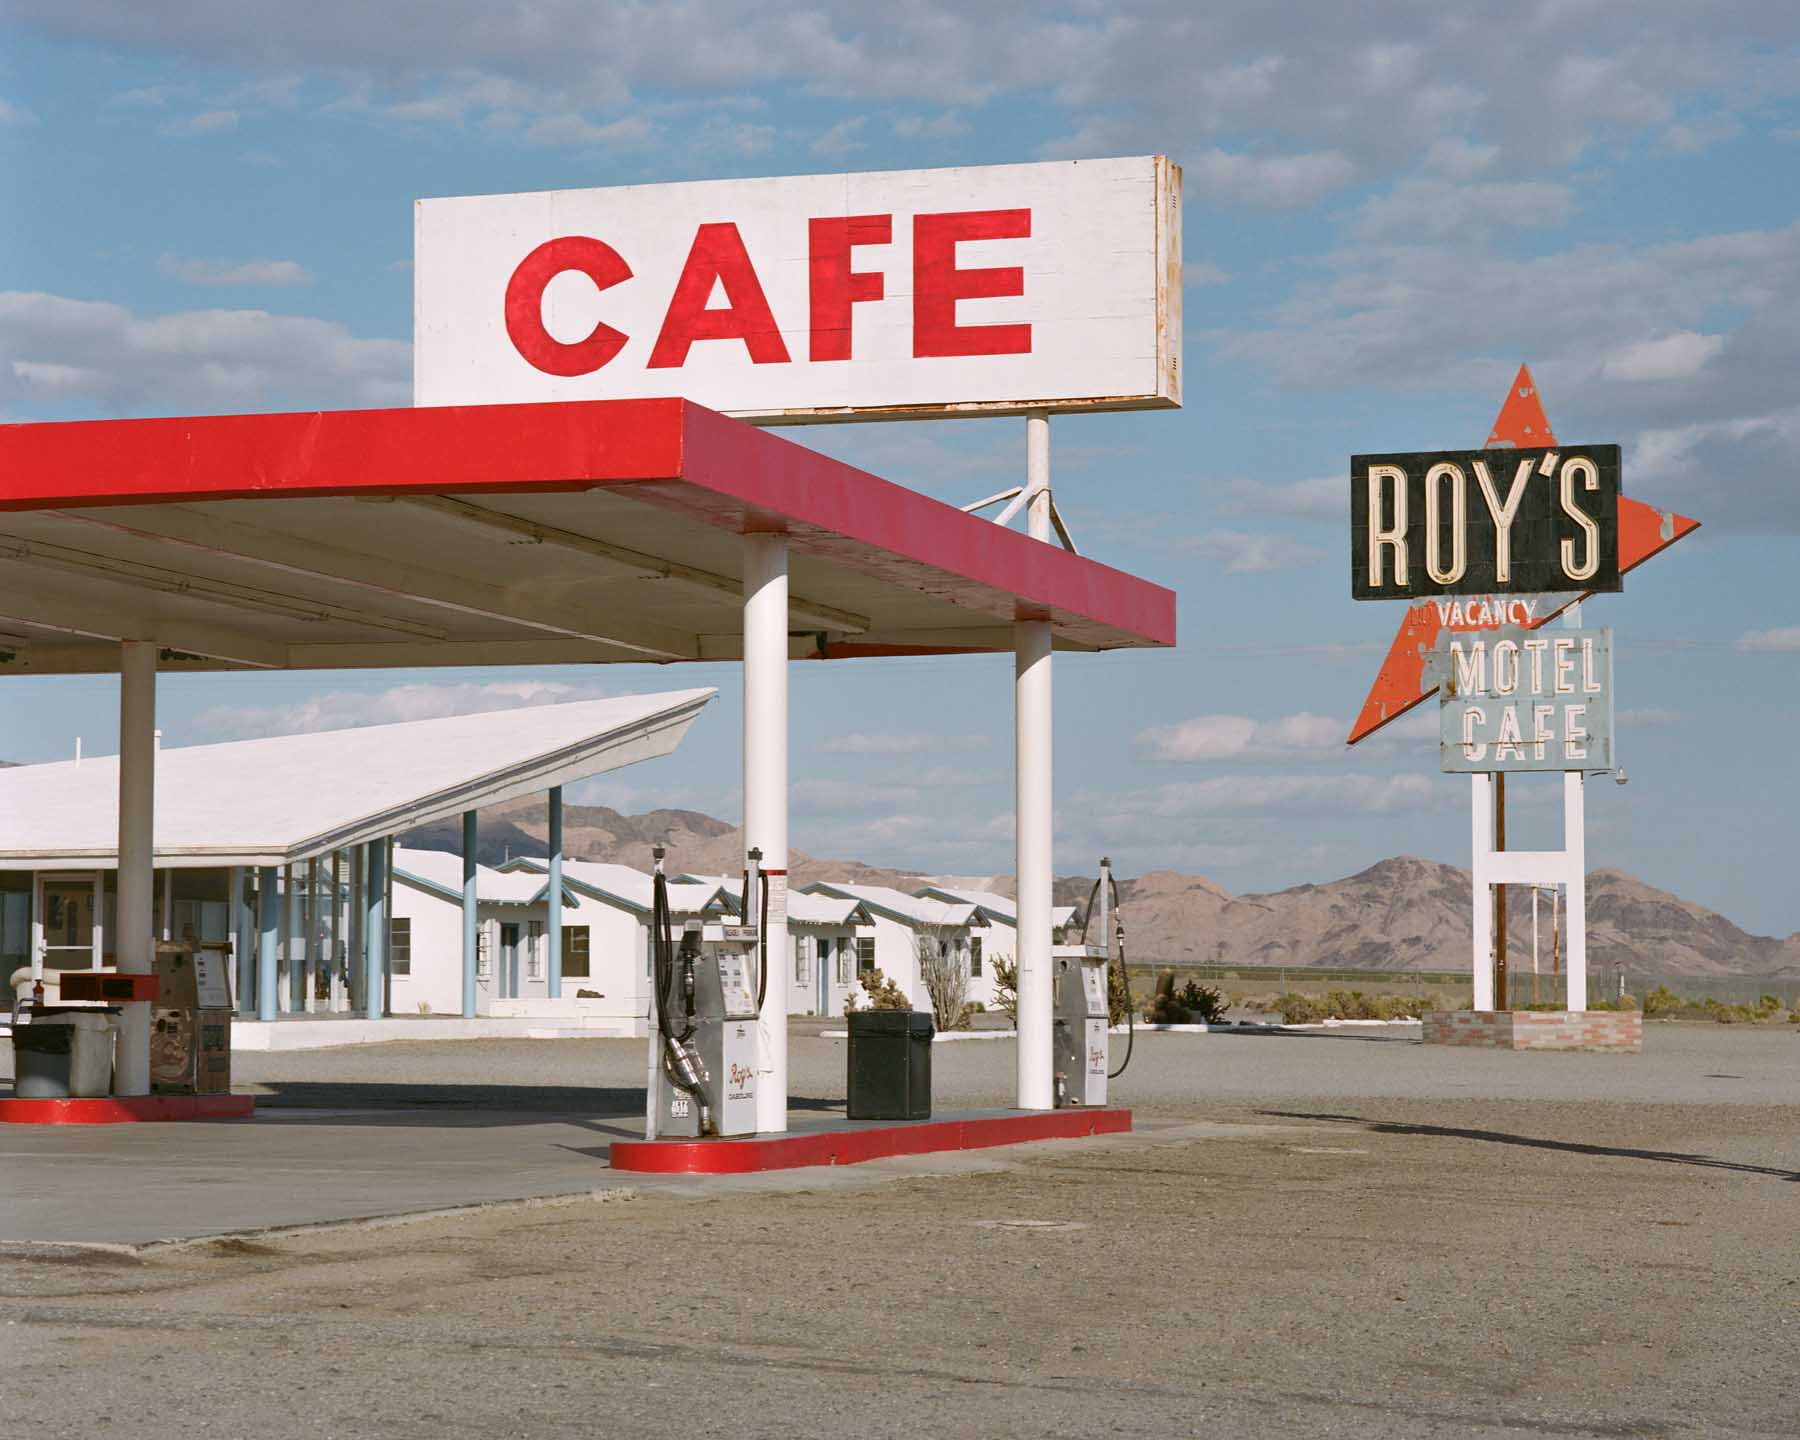 Dino Kužnik, Shaped by the West, Roy's Cafe